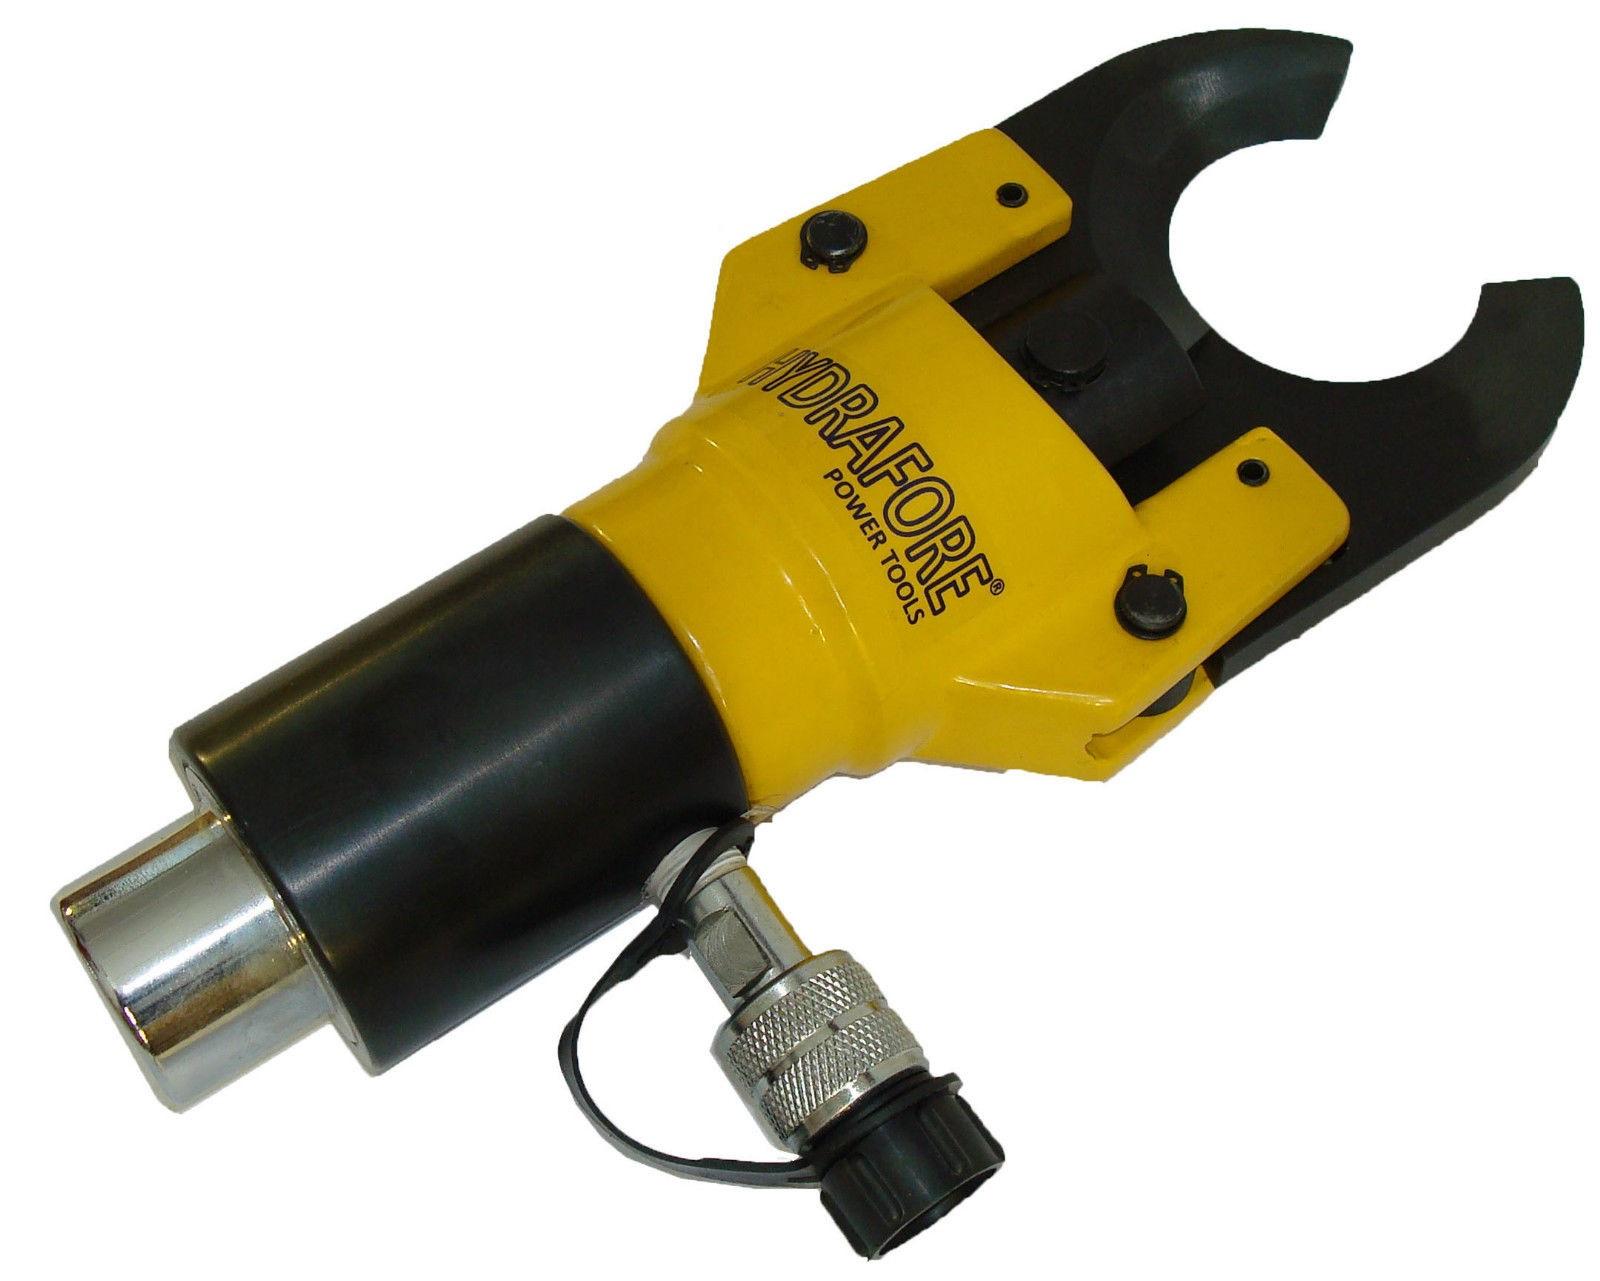 Hydraulic Jacks Cutters Pumps Low Profile Jacks